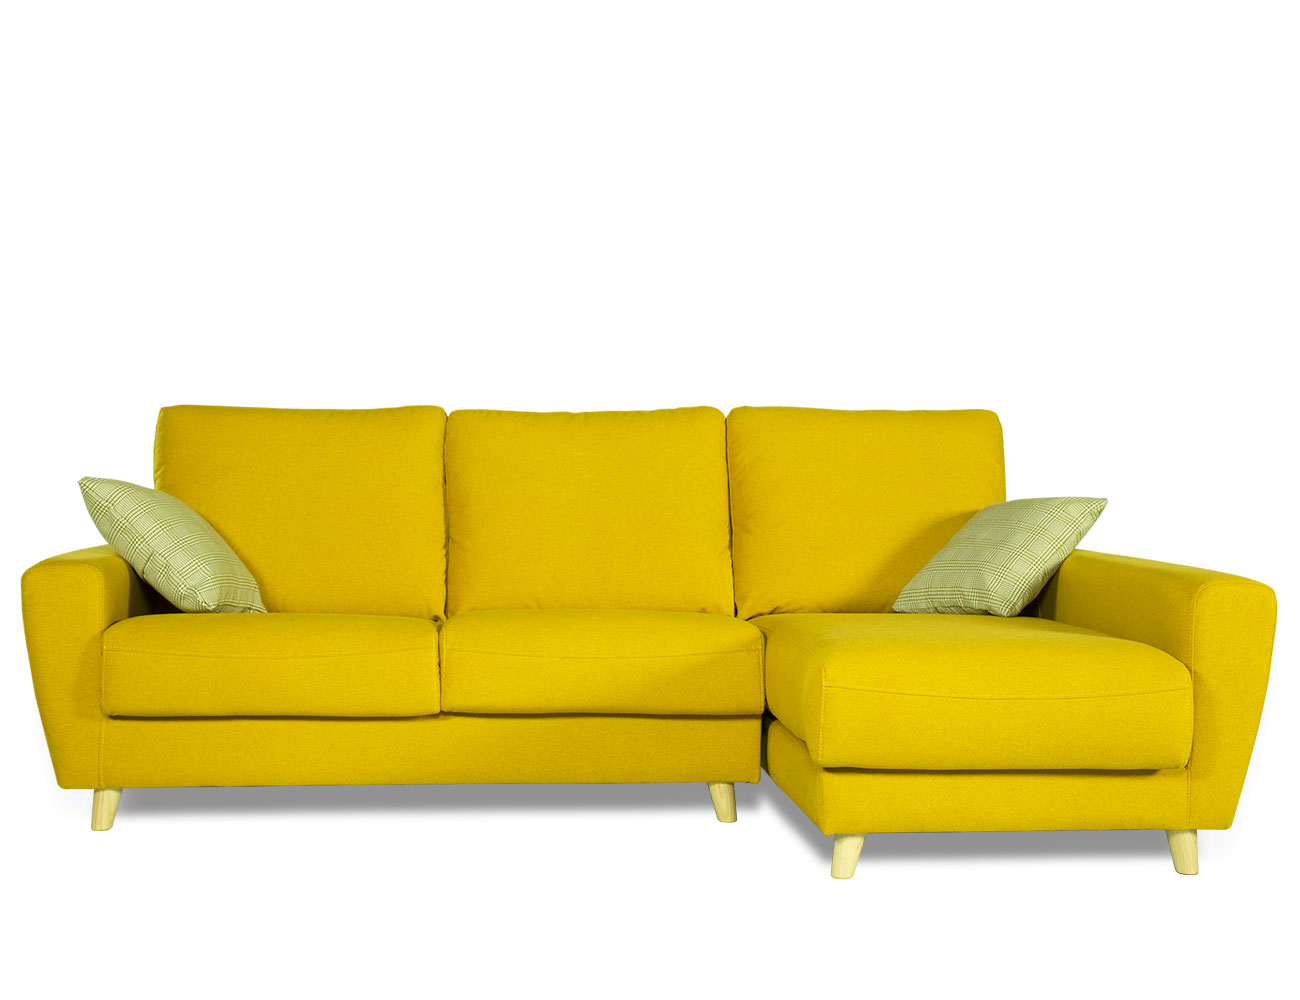 Sof chaiselogue con un dise o moderno y gran variedad de for Precios de sofas modernos